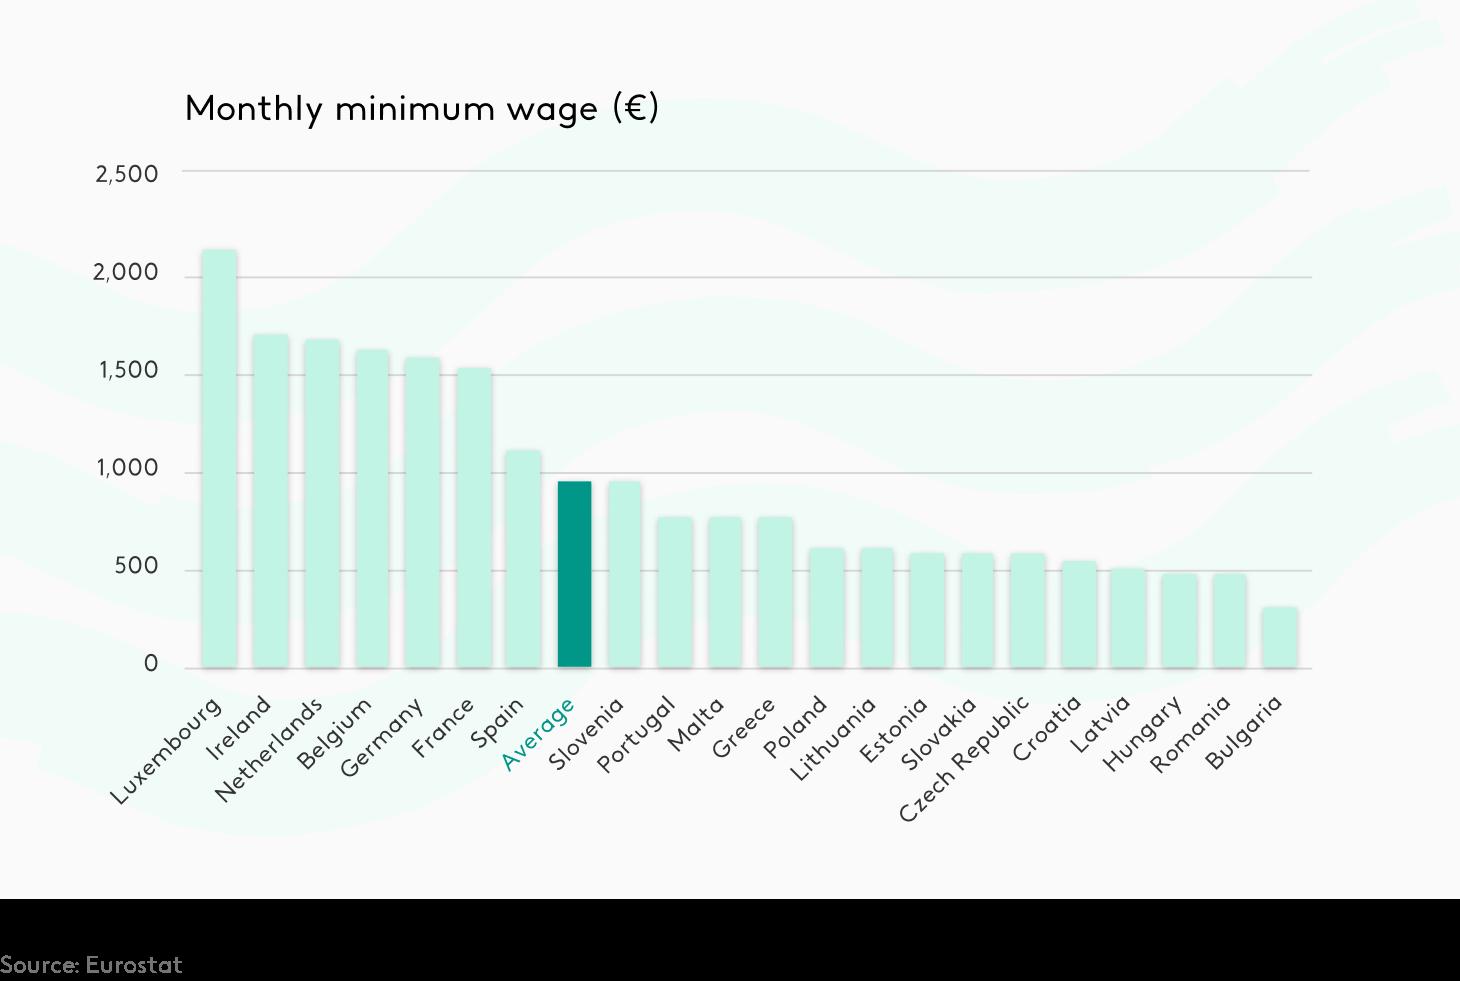 minimum wage per country